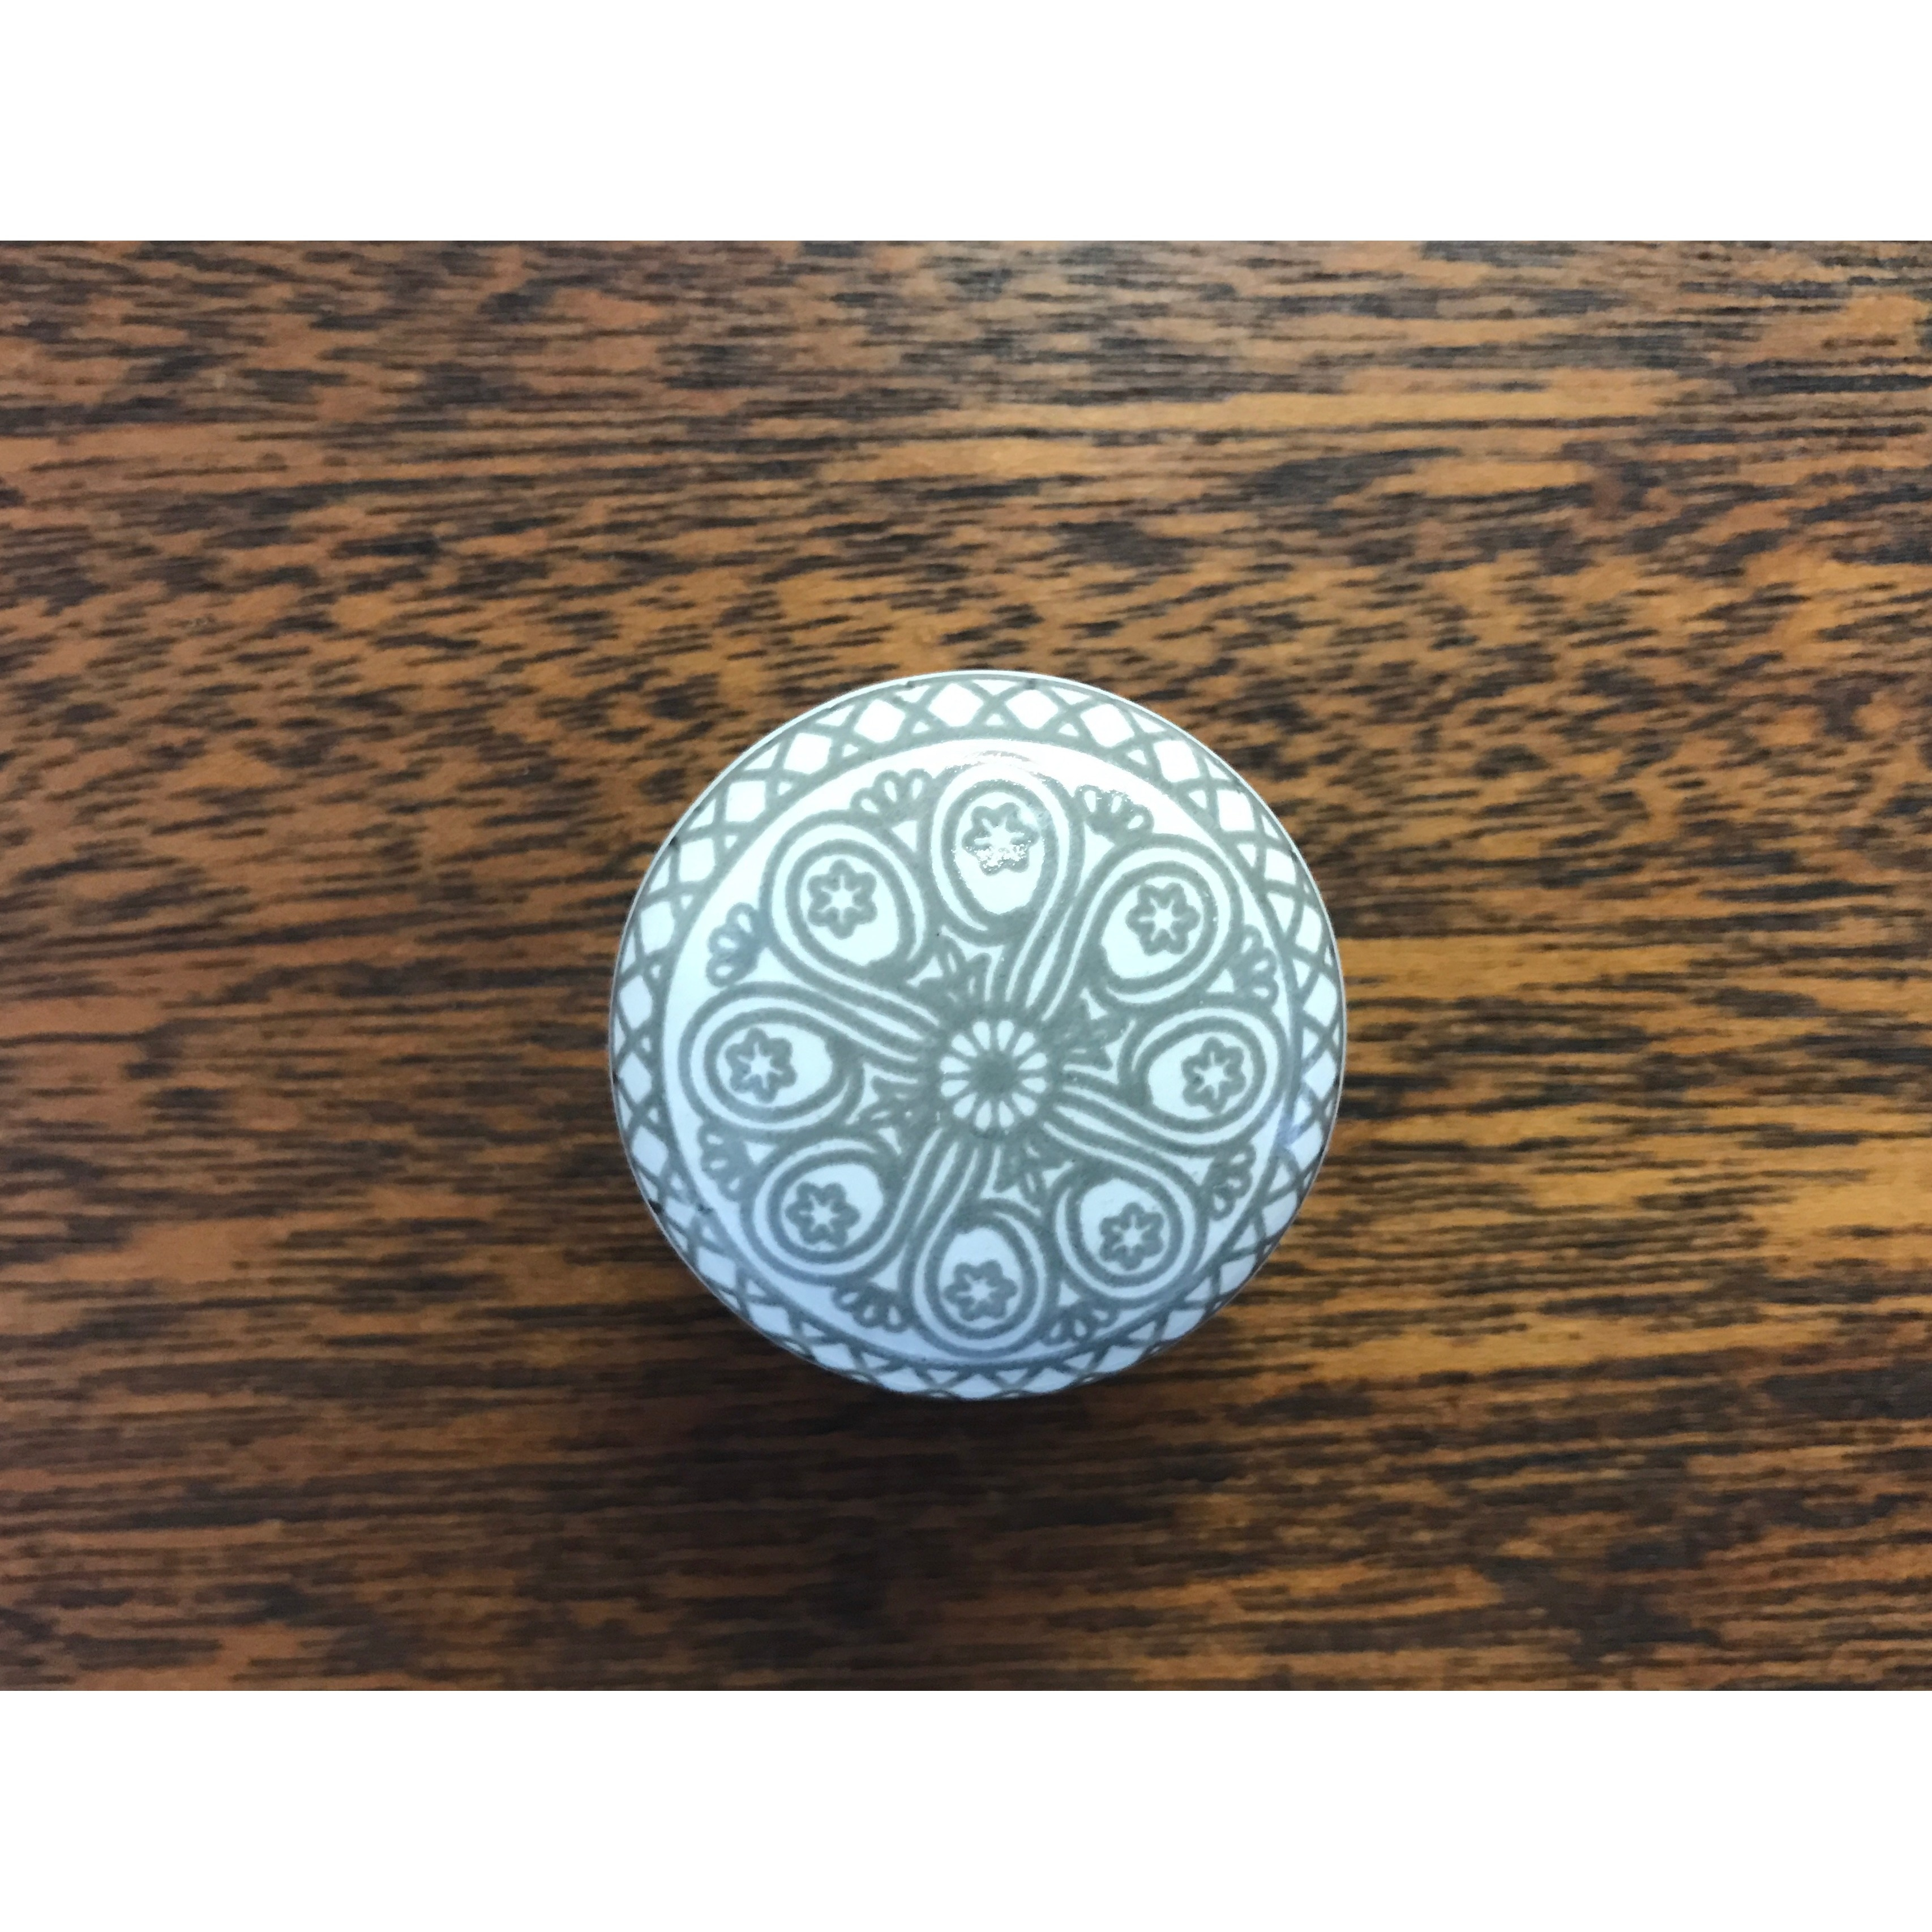 Grey Wheel Ceramic Drawer Knob Pulls (Pack of 6) - Free Shipping On ...